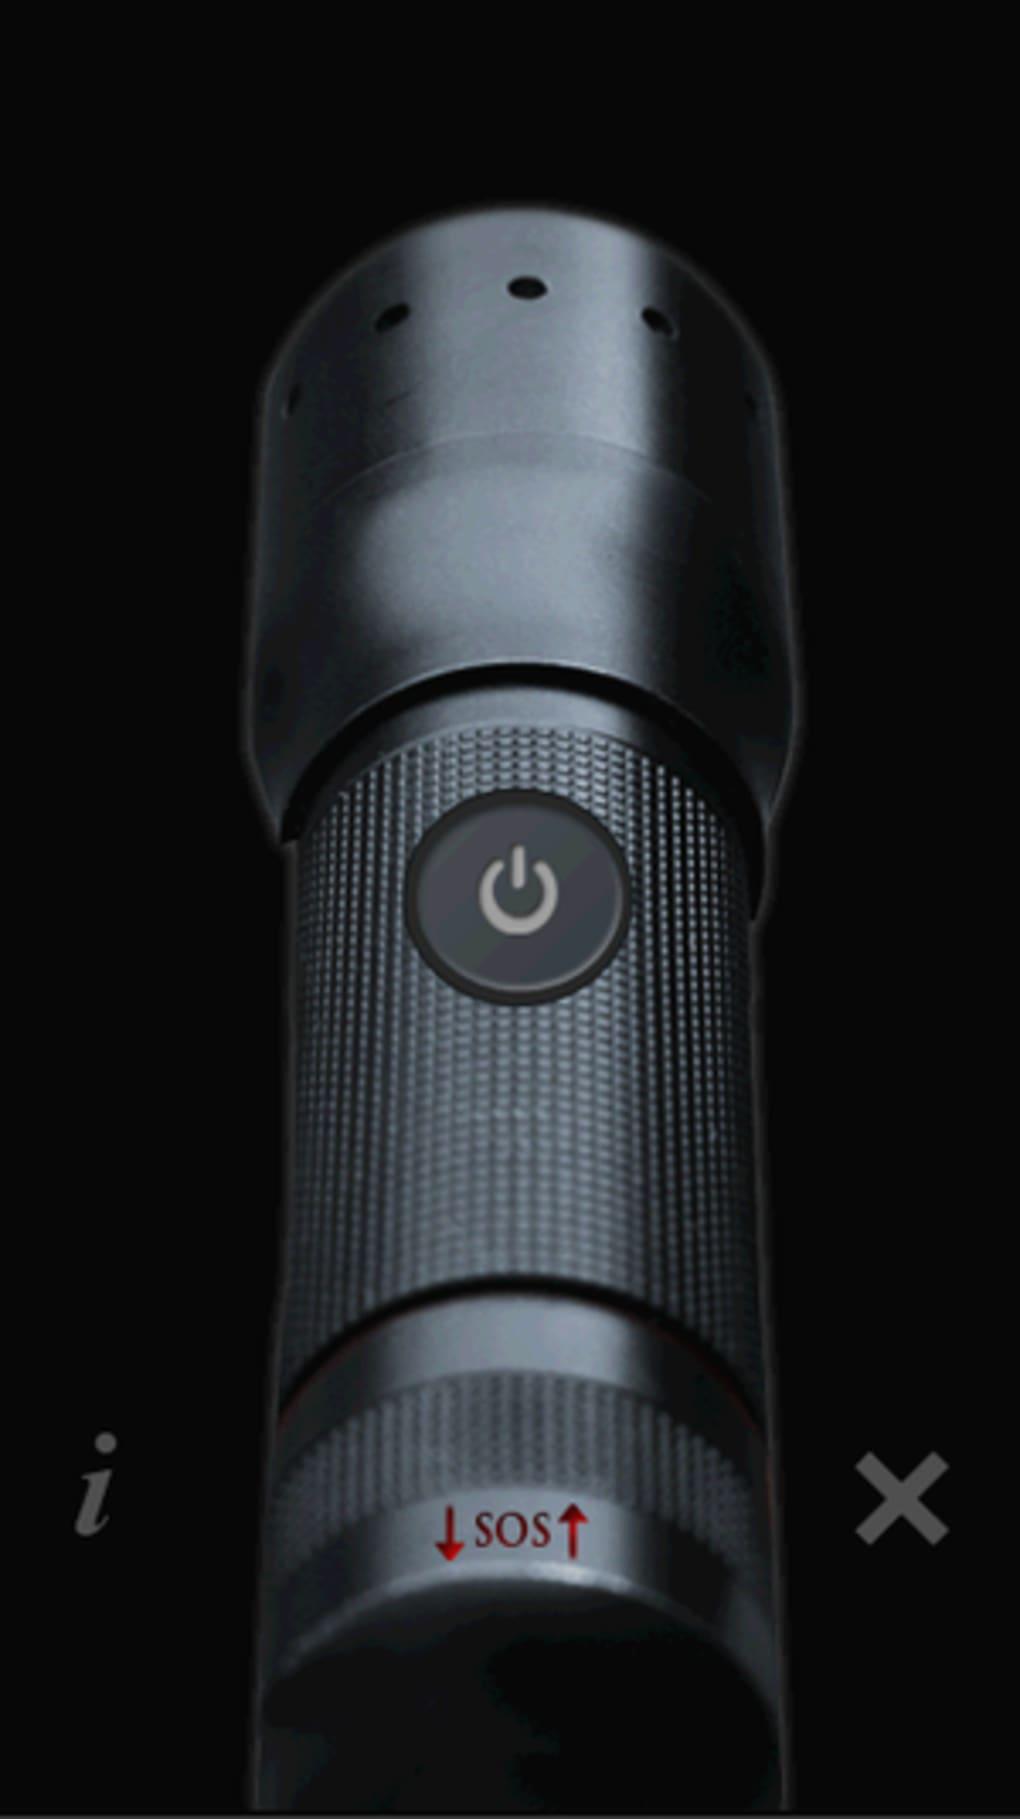 nokia 5800 el feneri programı flashlight extreme indir